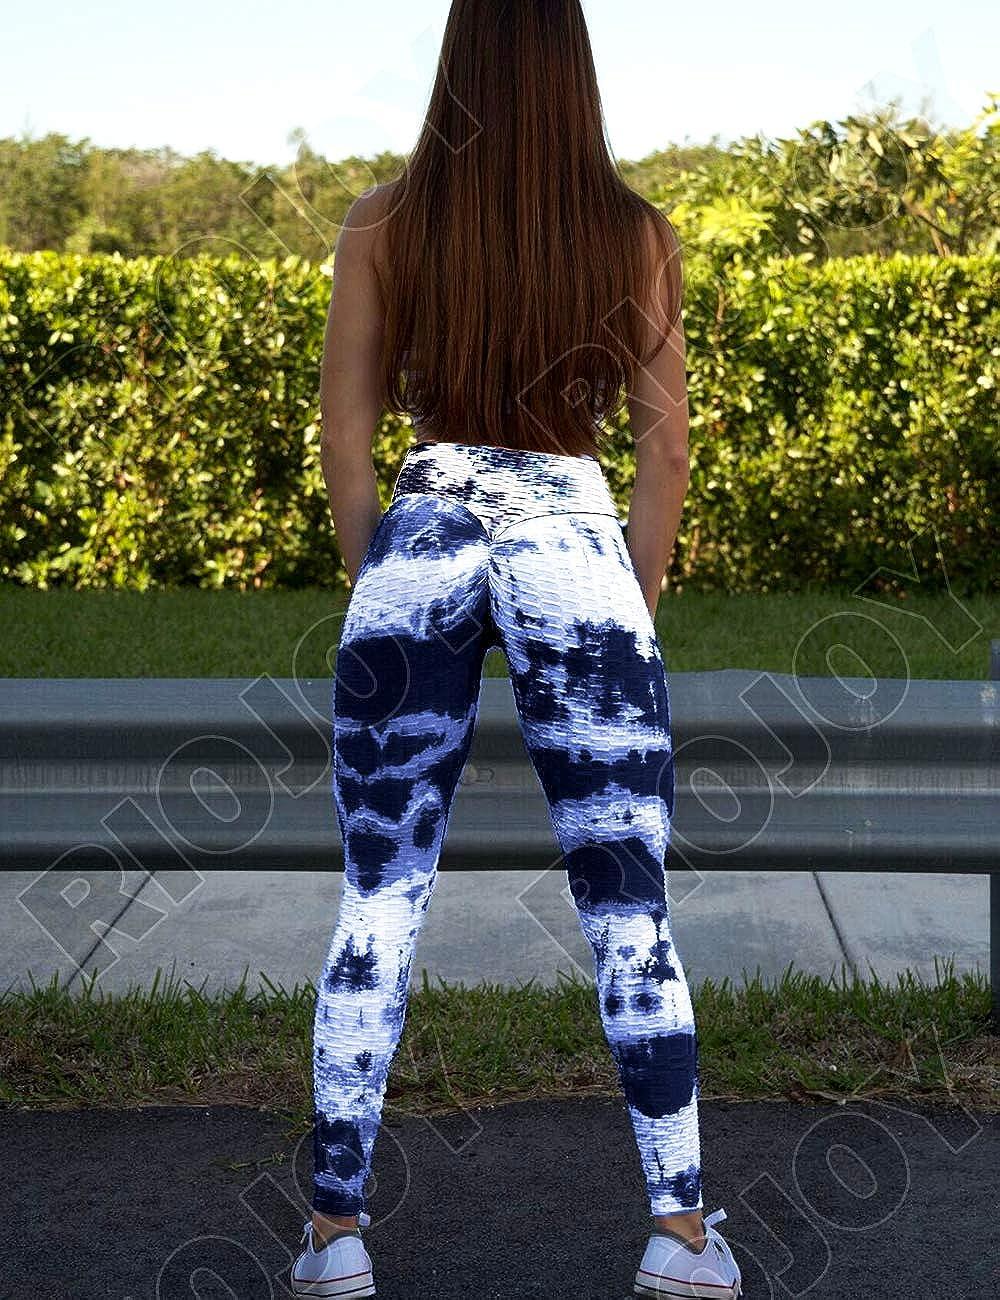 High Waist Gym Yoga Pants Scrunch//Ruched Butt Fitness Running Tights RIOJOY Womens Honeycomb Celulite Leggings